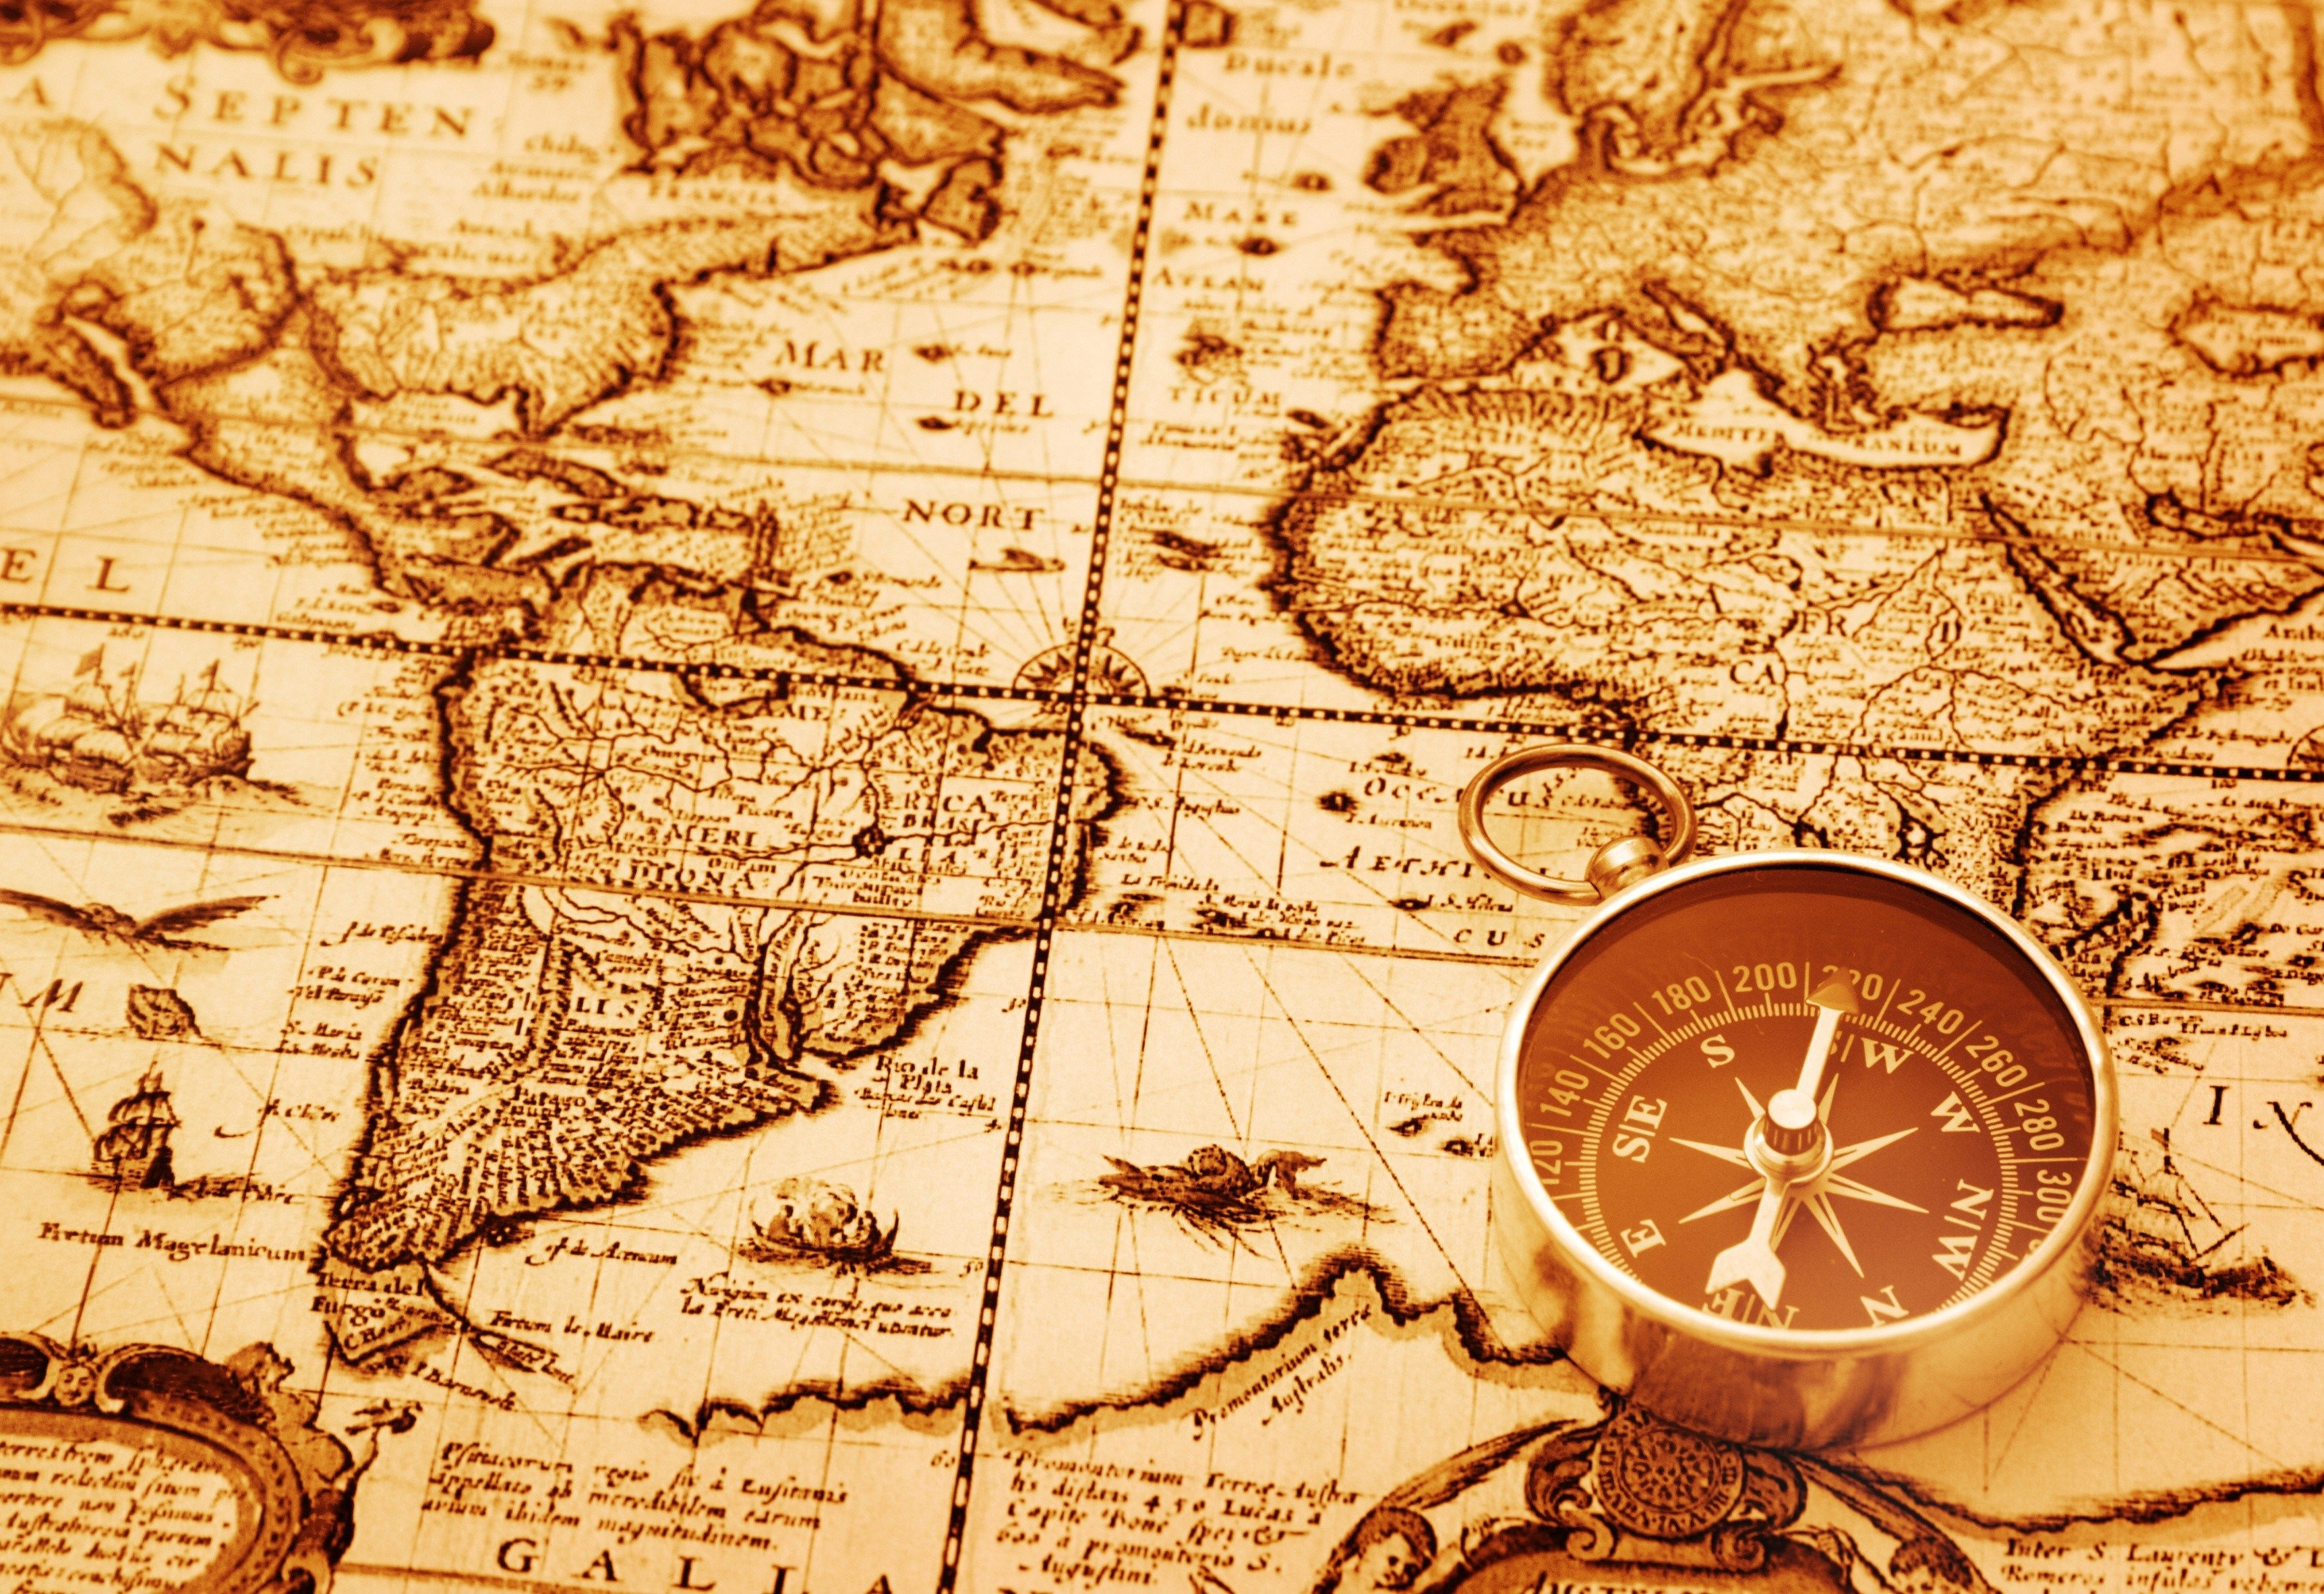 Fantastic Wallpaper High Resolution World Map - 9a7f773e5750bc03f56995338543d0dd  Pic_154277.jpg